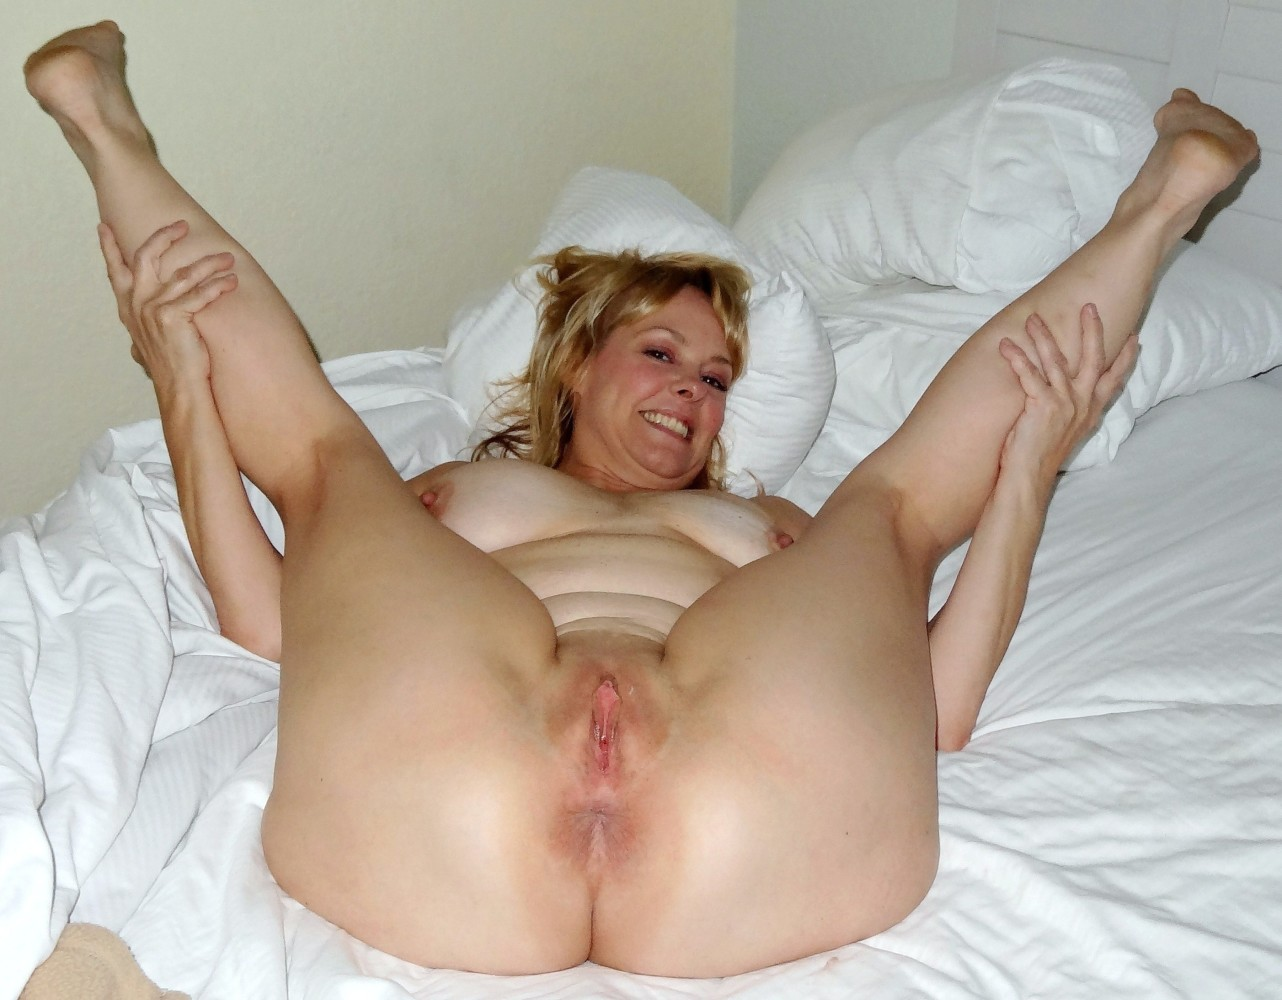 Mature open legs porn pics